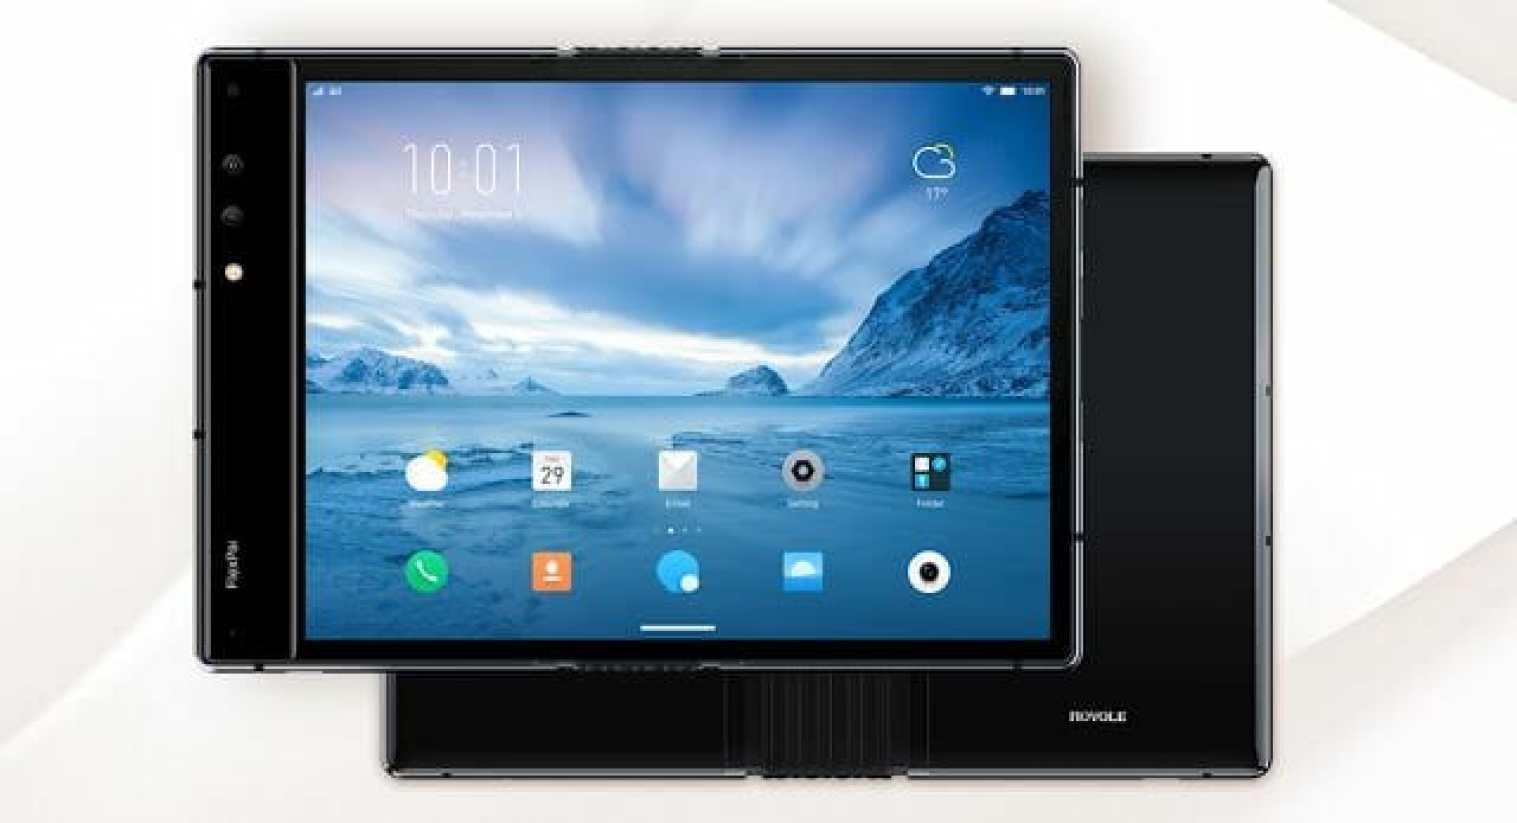 - Screenshot 16 3 - บริษัท Rayole เผยโฉม FlexPai สมาร์ทโฟนจอพับได้รุ่นแรกของโลก